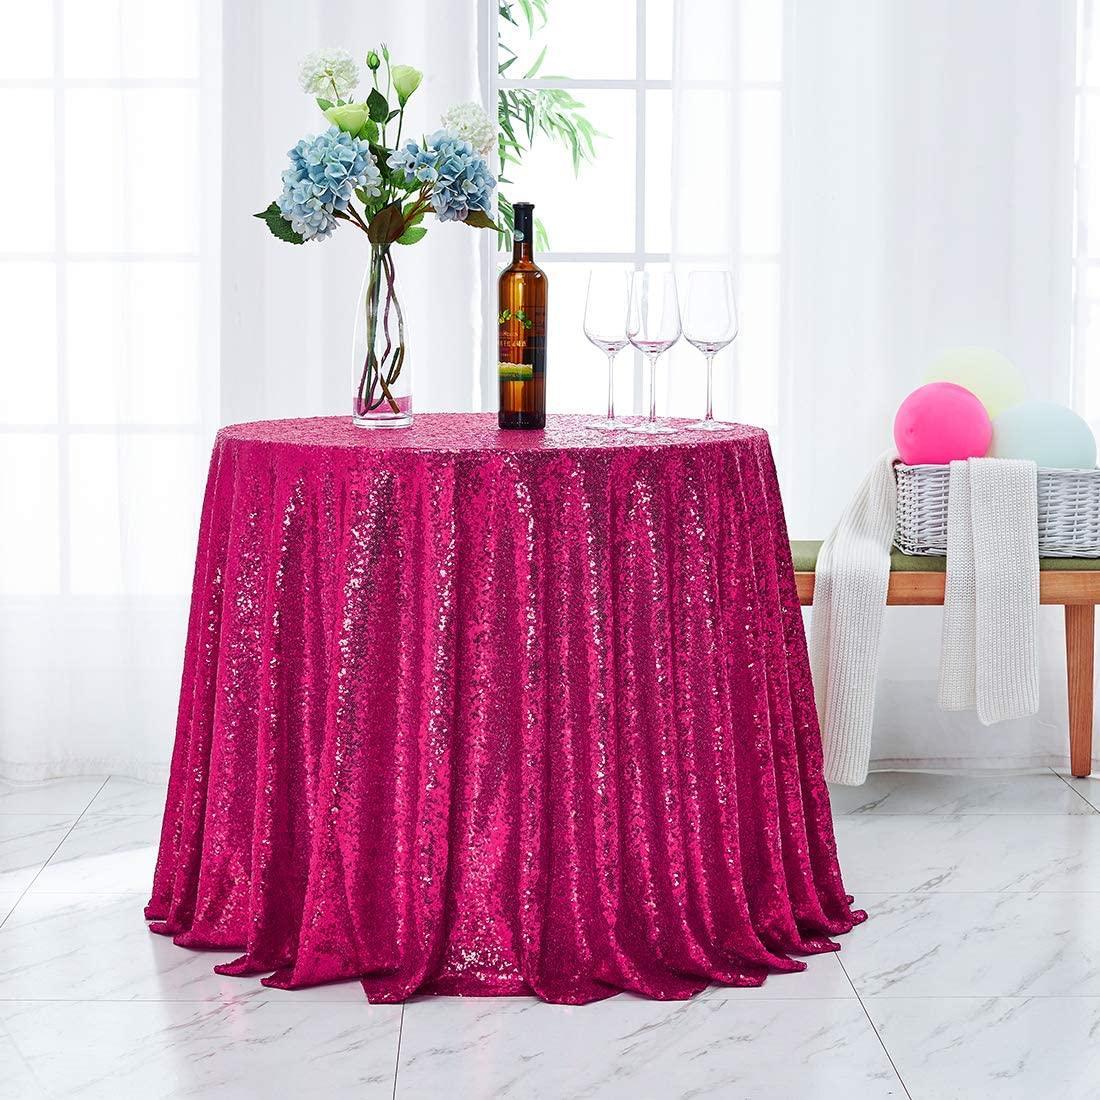 Hahuho Fuchsia Sequin Tablecloth 90 inch Round, Glitter Tablecloth for Bridal Shower Decorations, Birthday, Wedding, Dessert, Banquet(90 inch Round, Fuchsia)